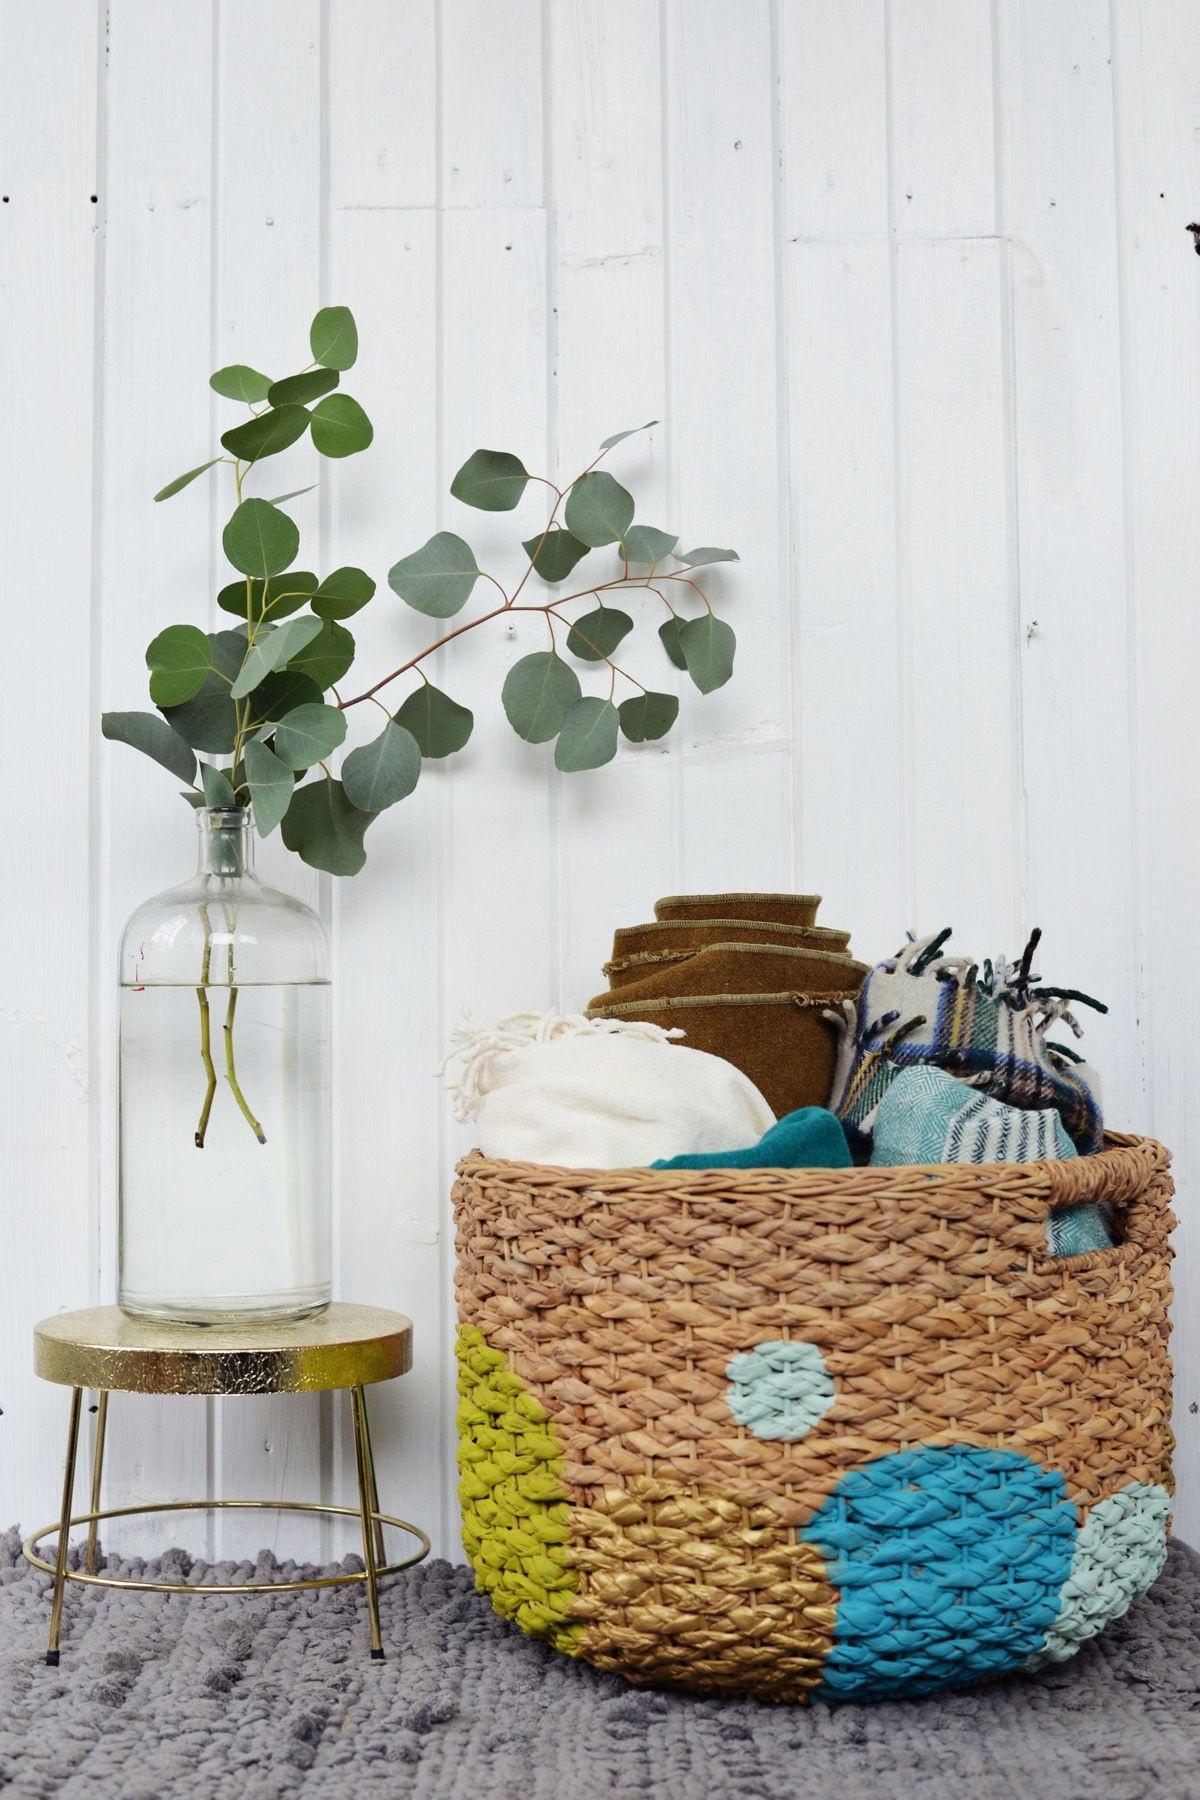 DIY Painted Basket Diy & Crafts